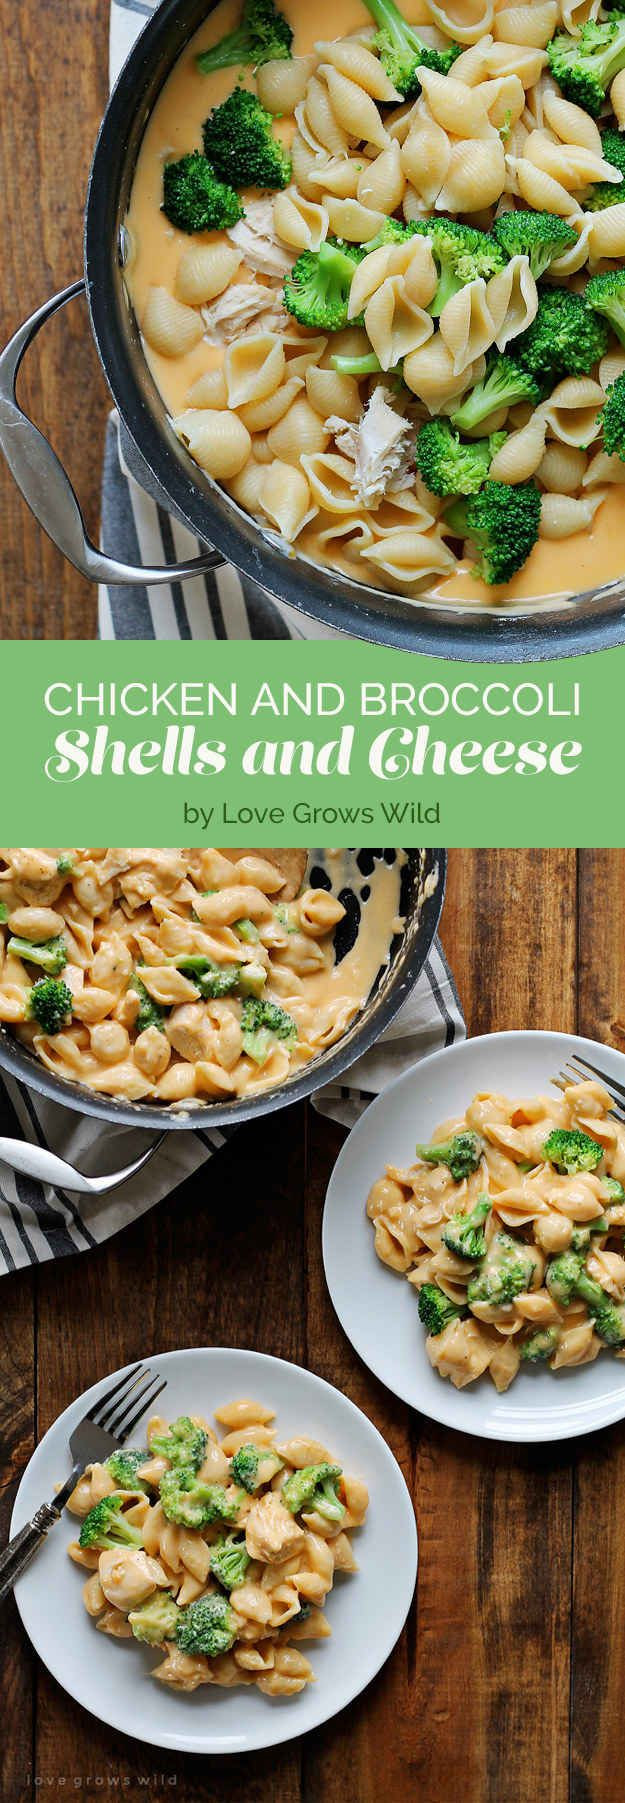 Fall Recipes Dinner  Best 25 Fall dinner recipes ideas on Pinterest